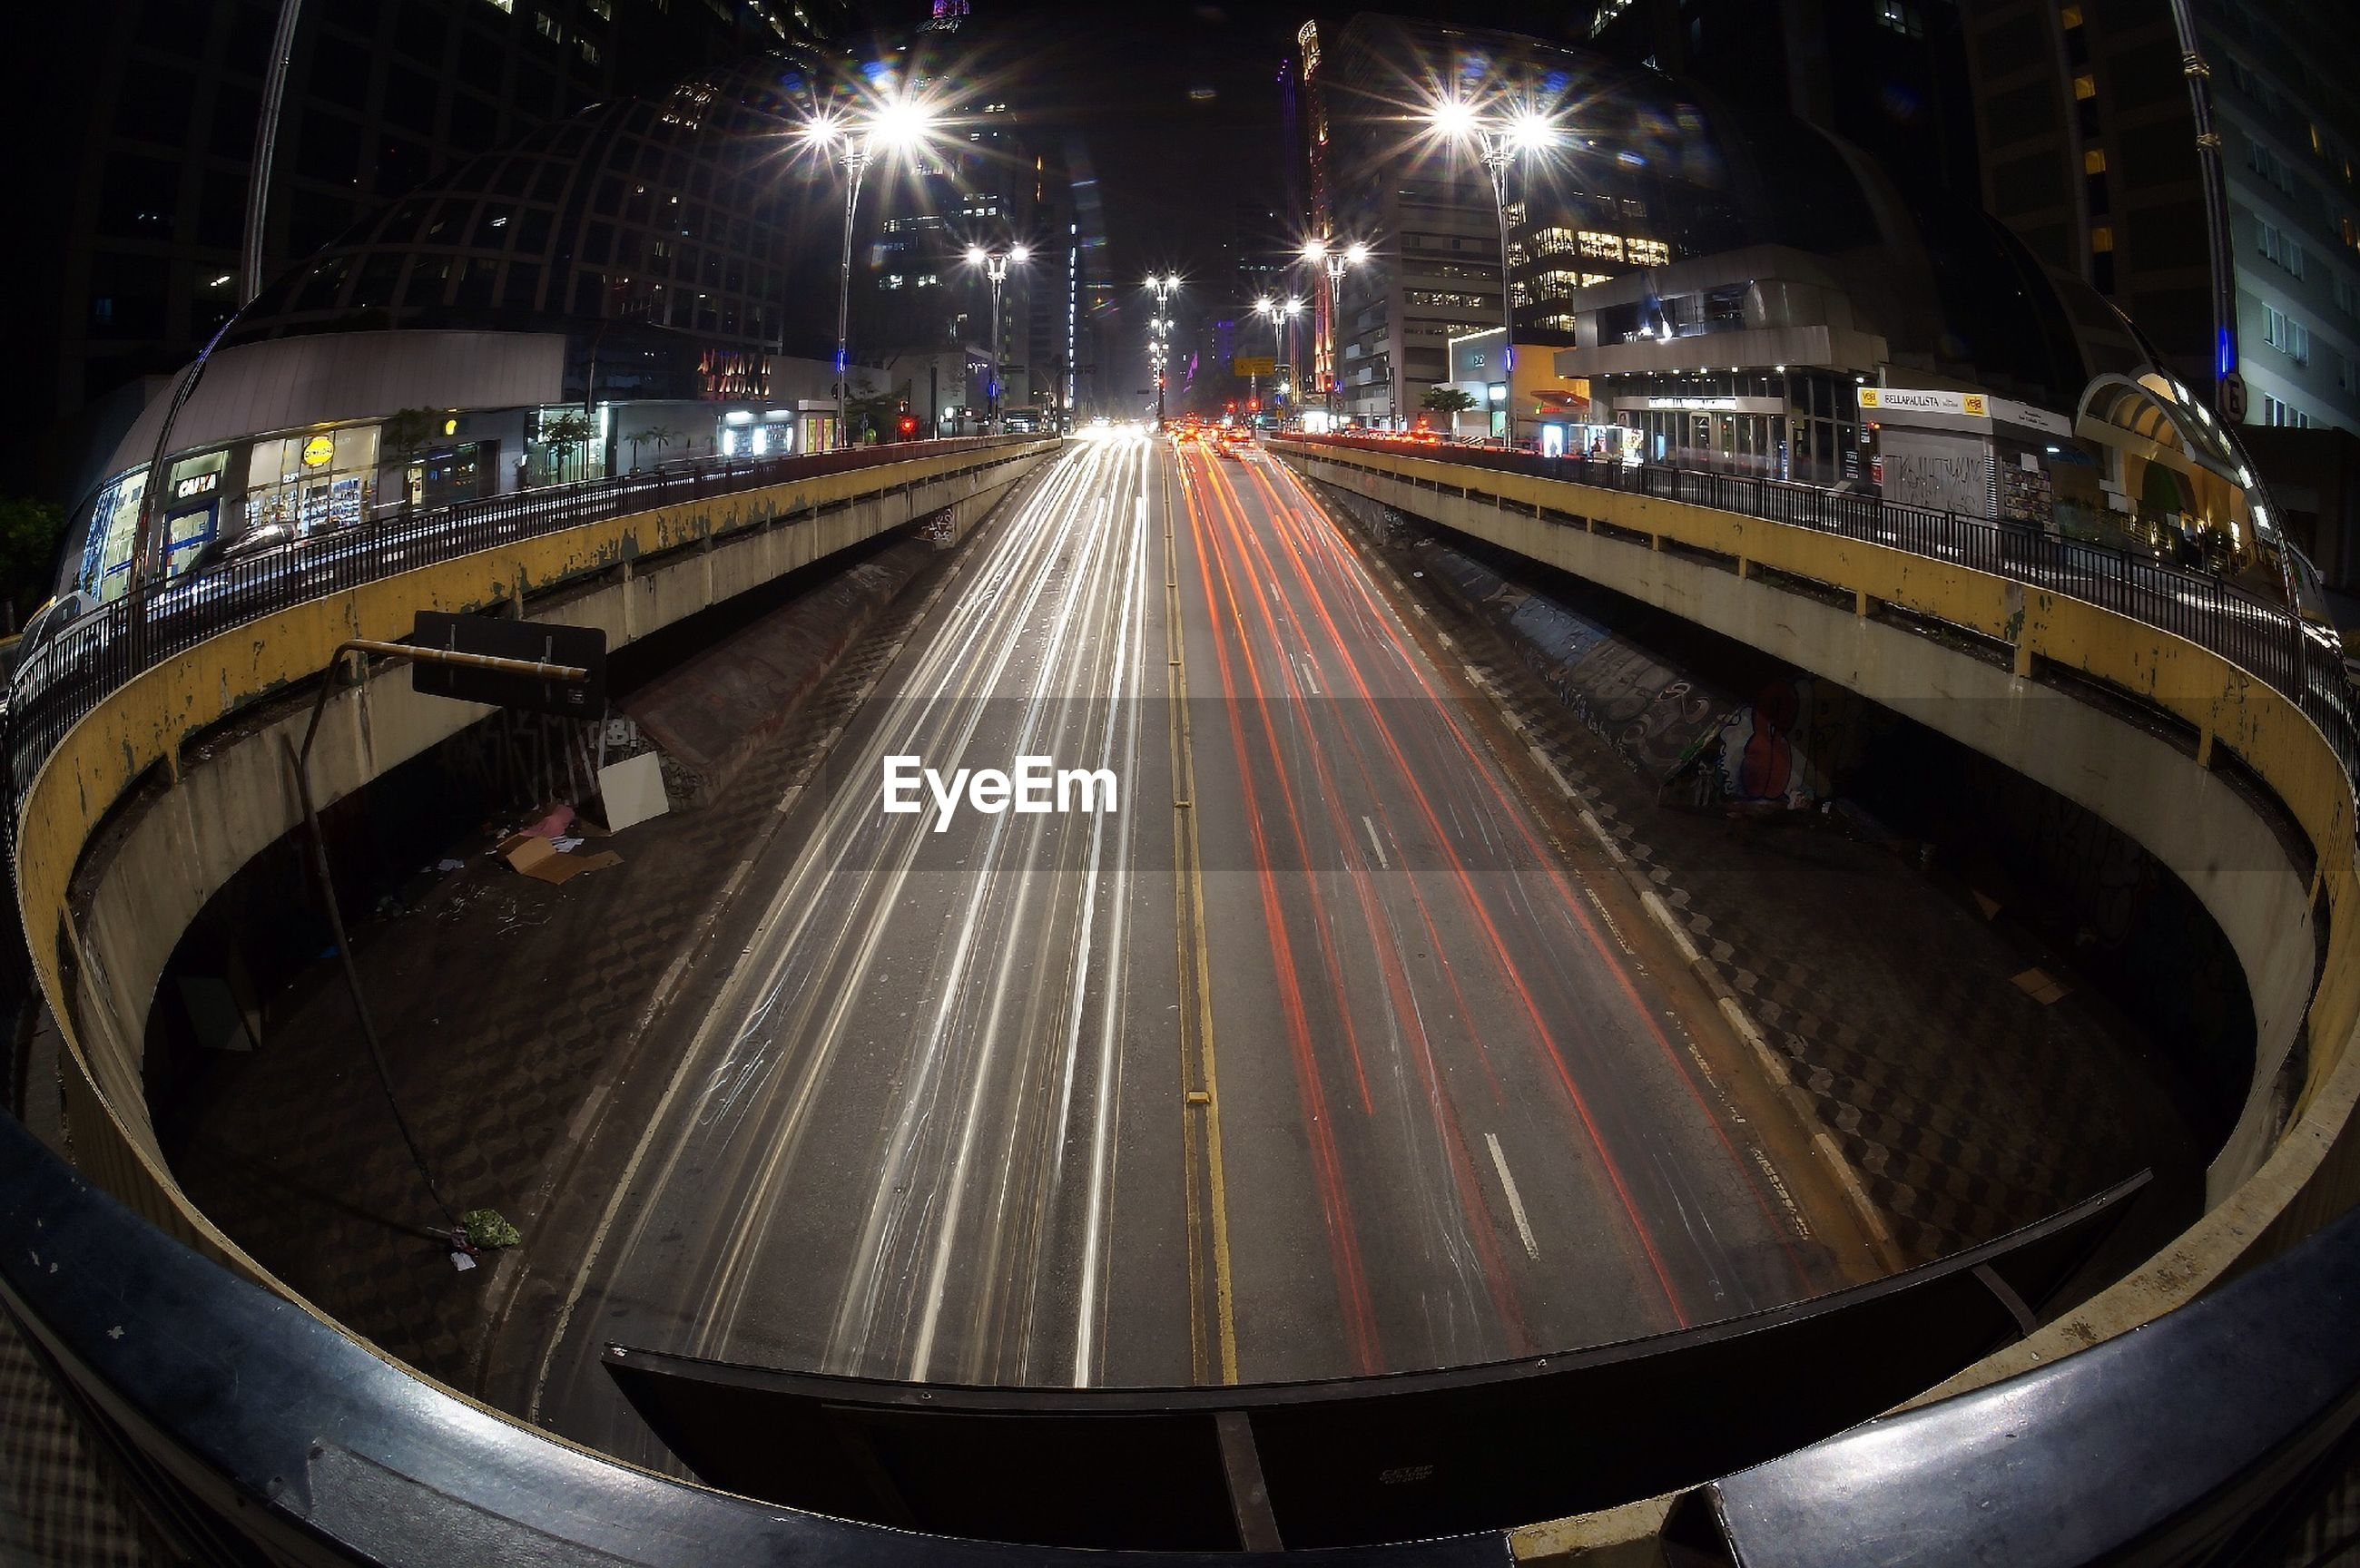 Circular bridge over multiple lane highway in city